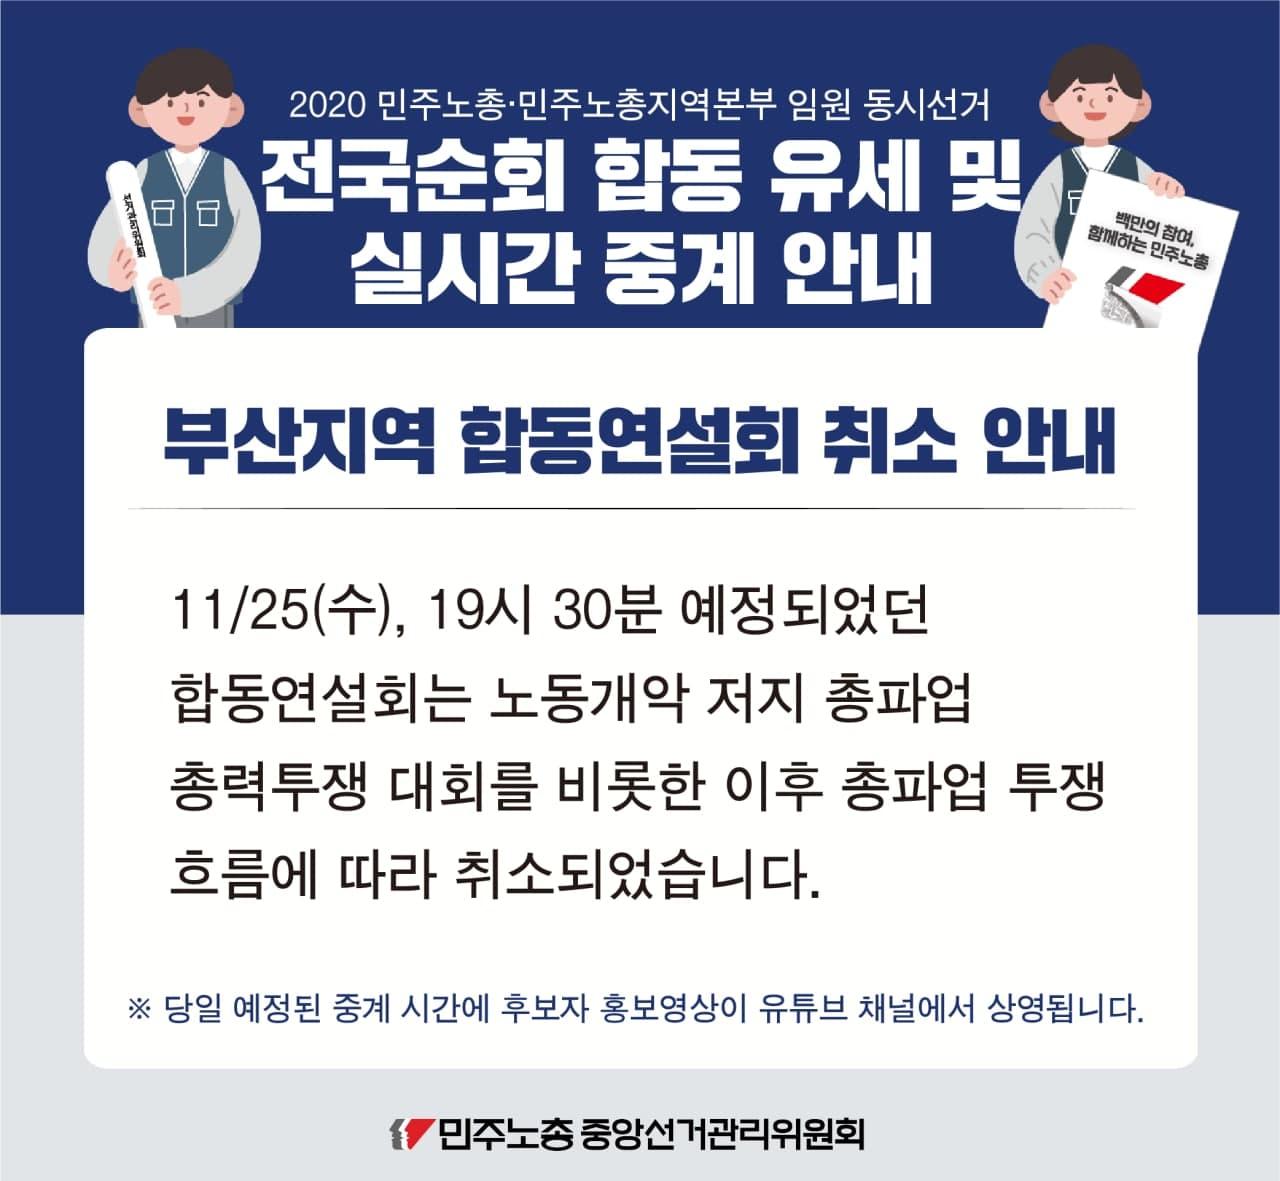 photo_2020-11-20_17-51-23.jpg